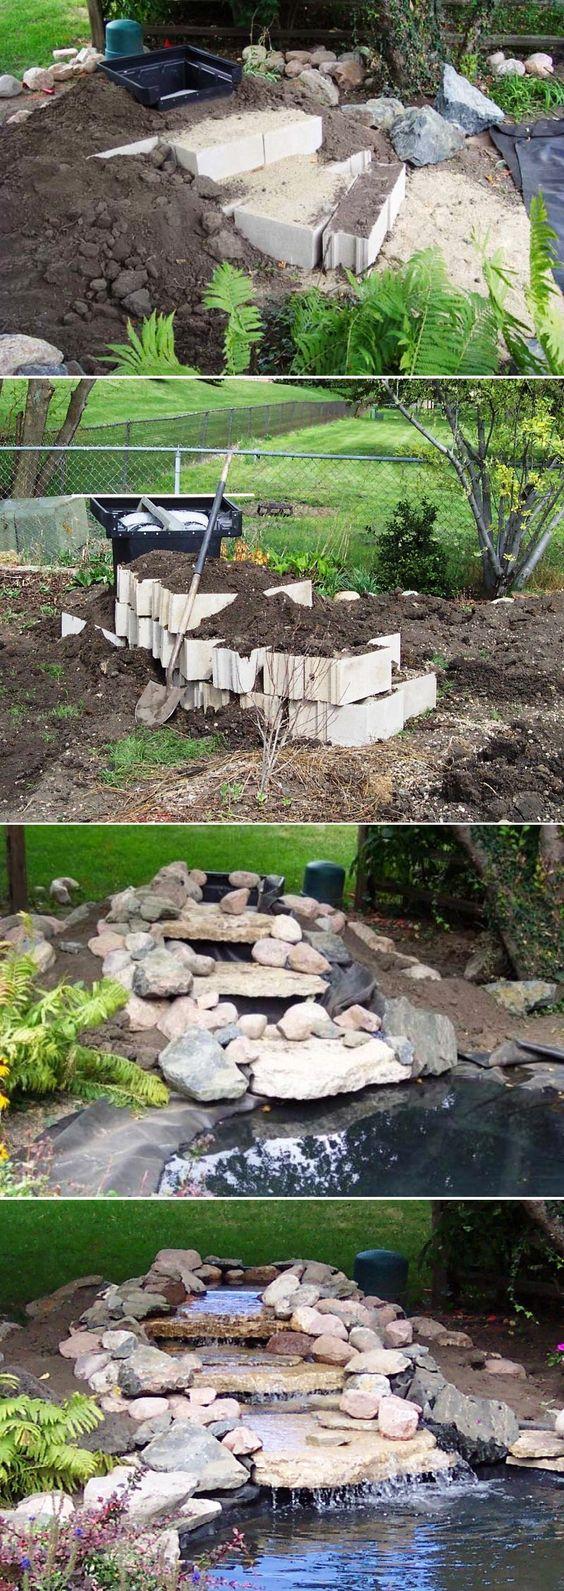 20+ DIY Backyard Pond Ideas On A Budget That You Will Love on Pond Ideas Backyard id=85390